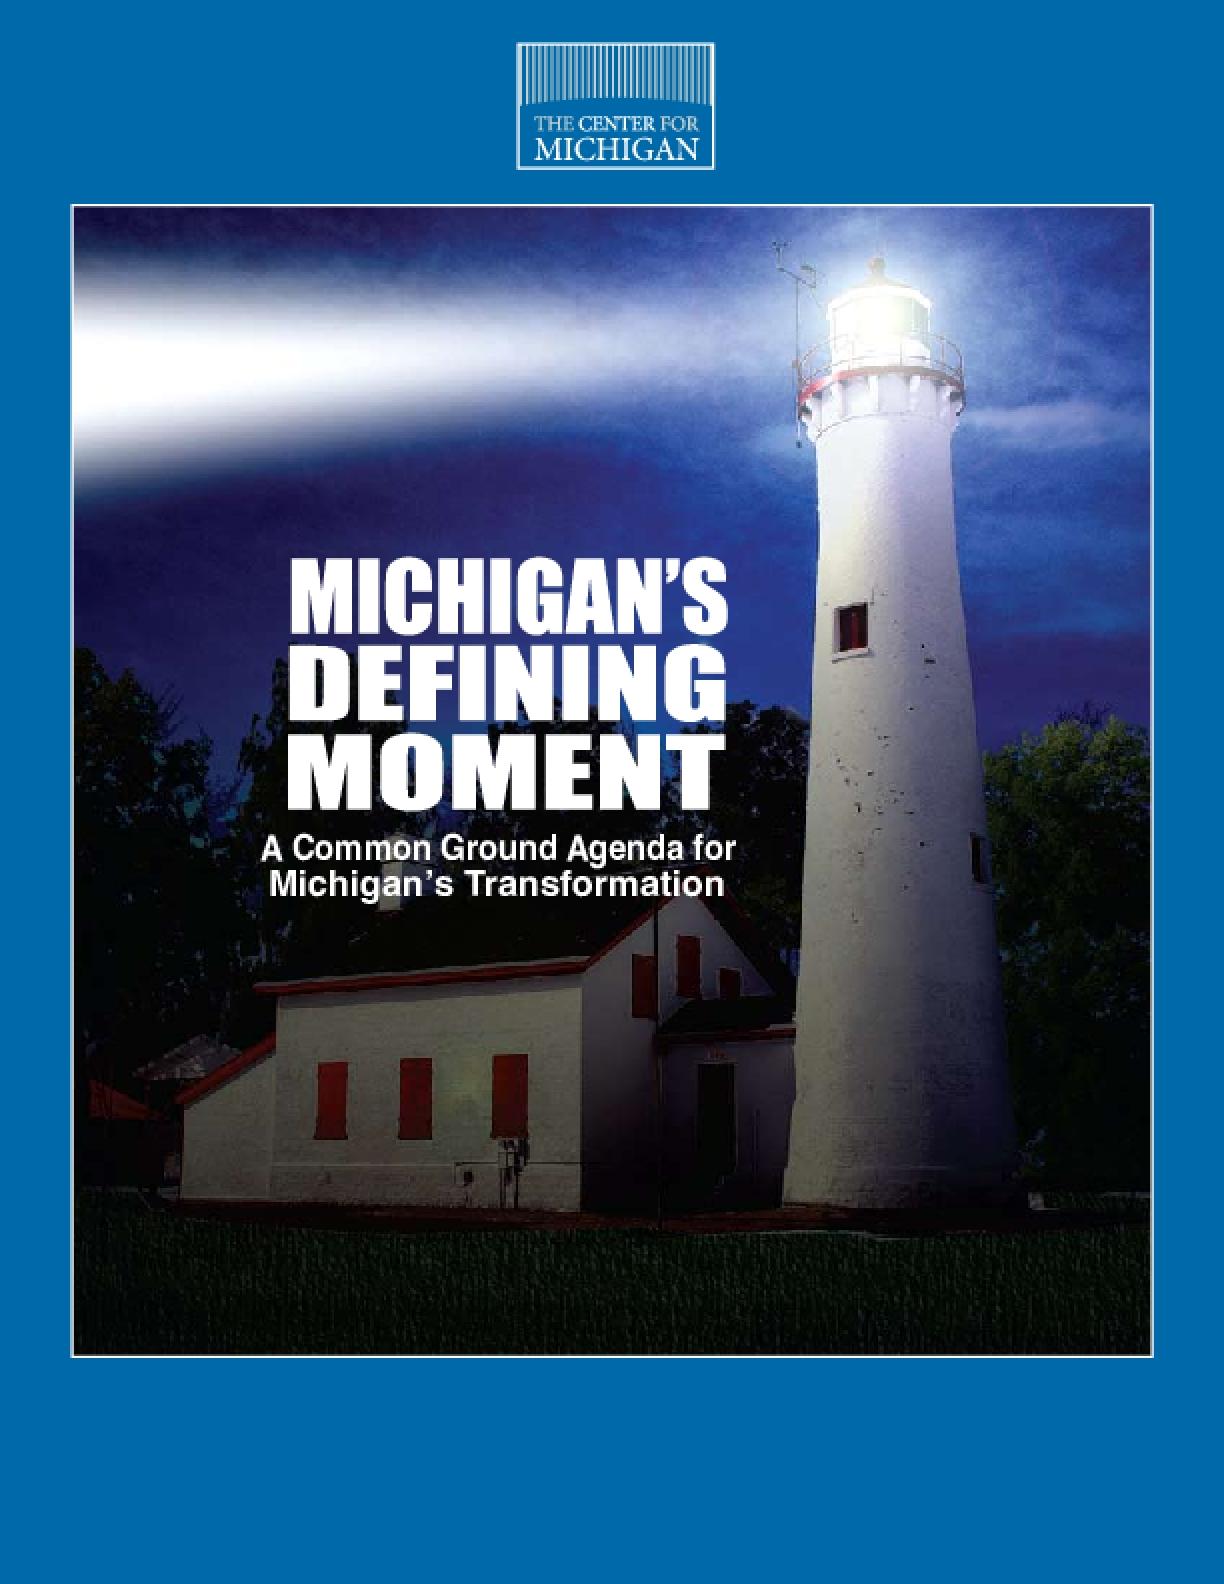 Michigan's Defining Moment: A Common Ground Agenda for Michigan's Transformation